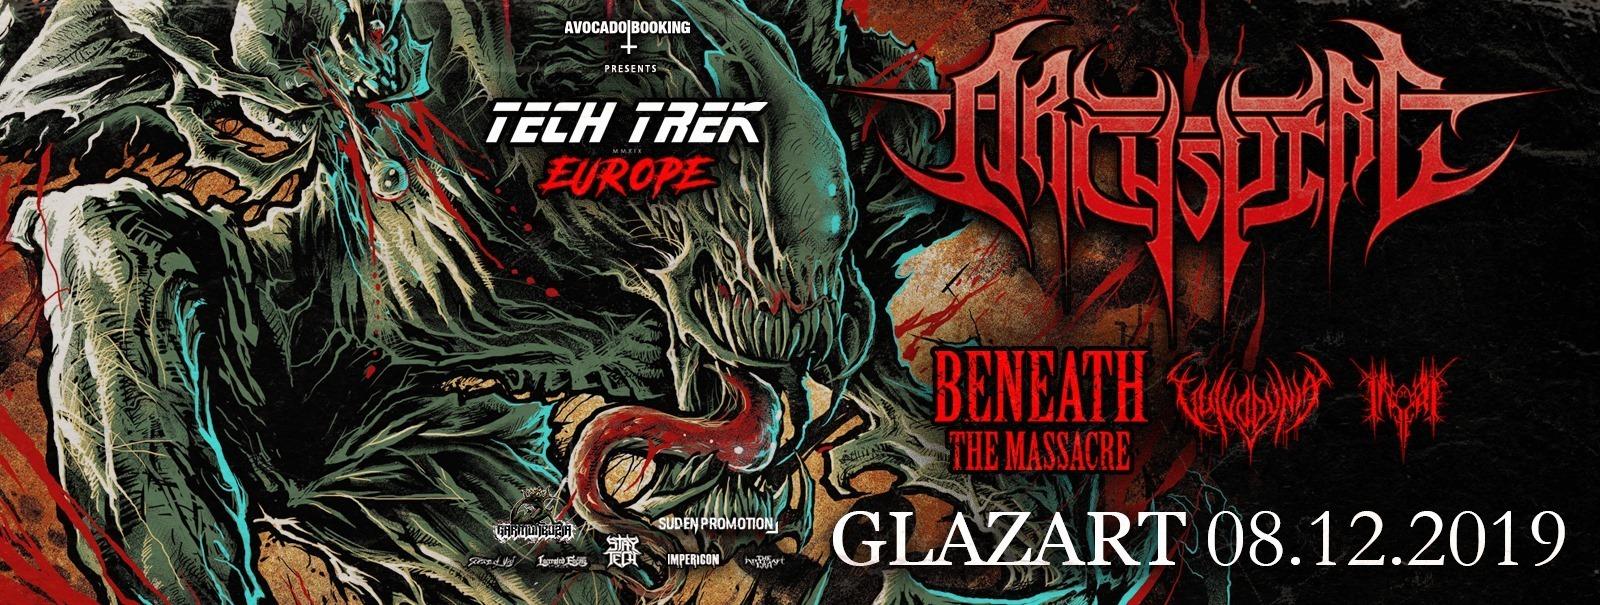 Concert d'Archspire, Beneath The Massacre, Vulvodynia, Inferi au Glazart à Paris